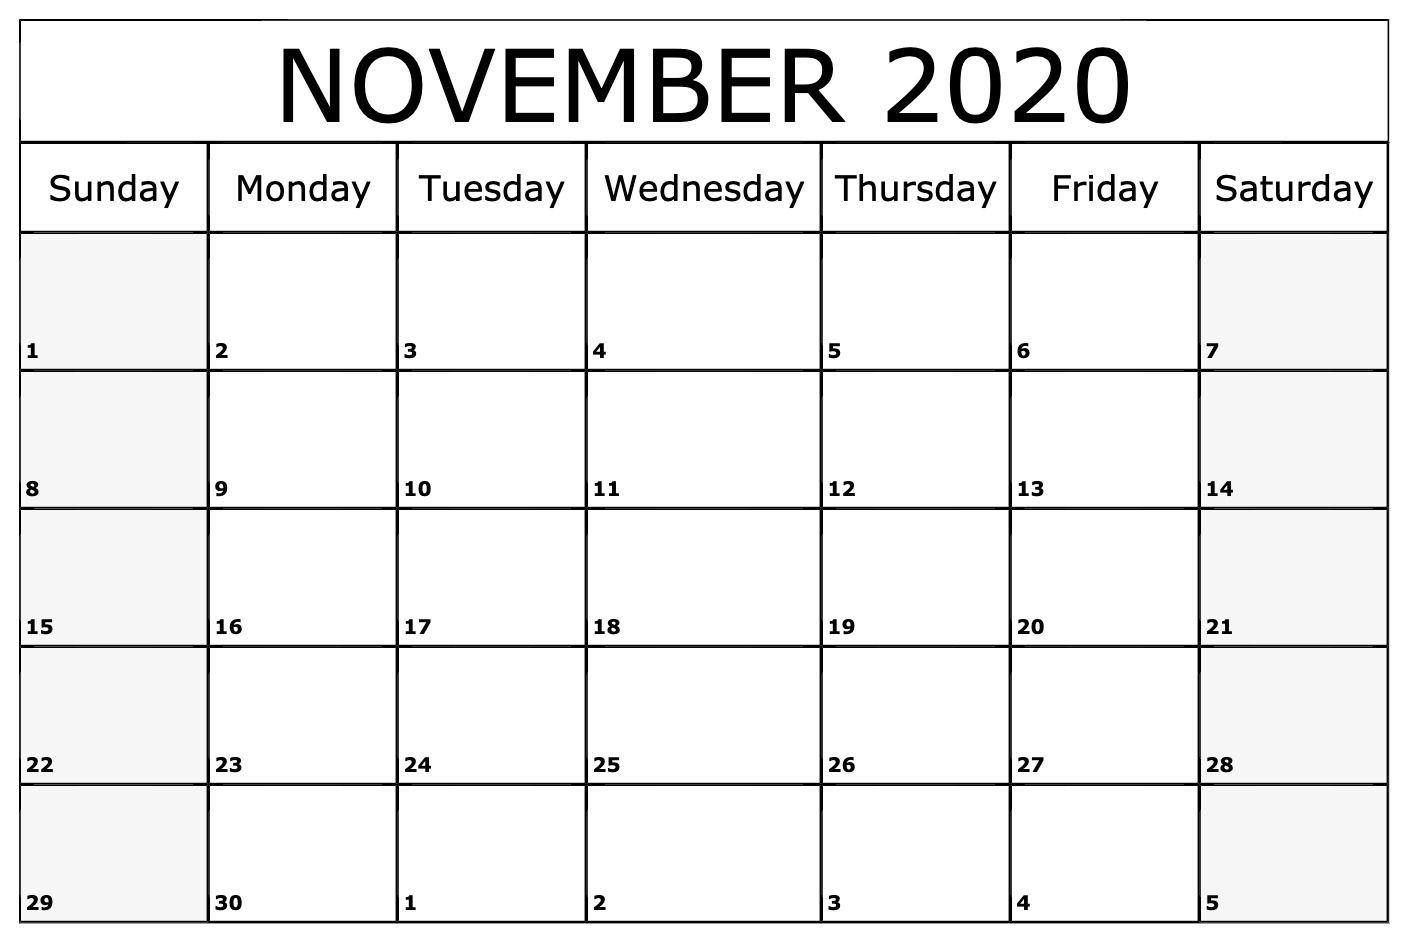 Free Download November 2020 Calendar Wallpapers Top November with regard to October & November 2020 Calendar